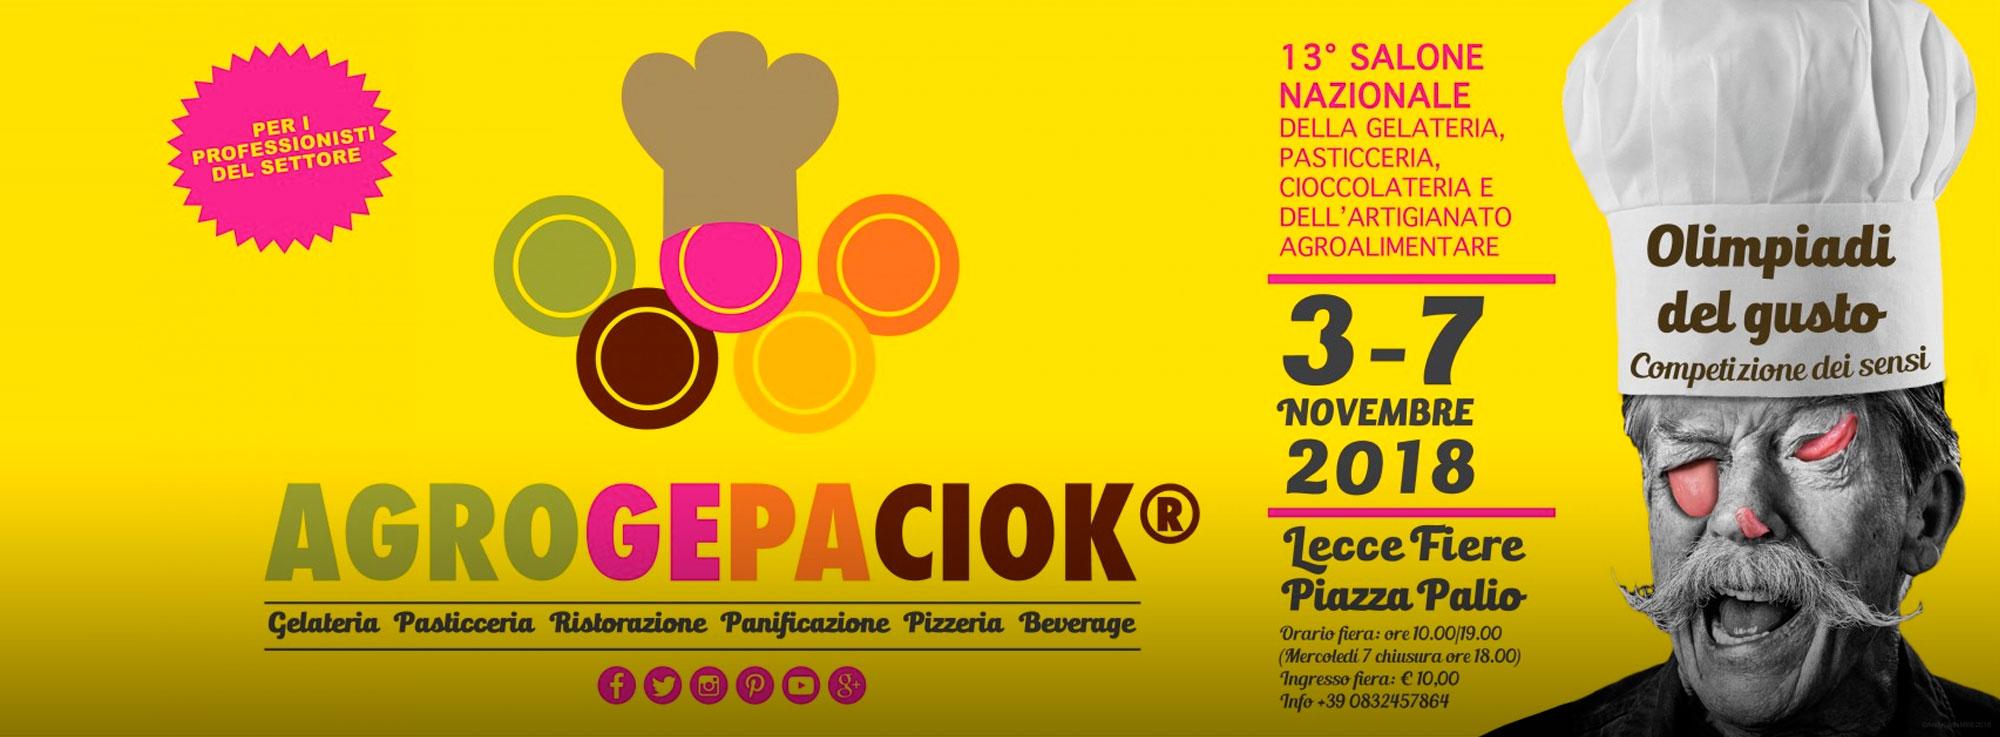 Lecce: Agrogepaciok